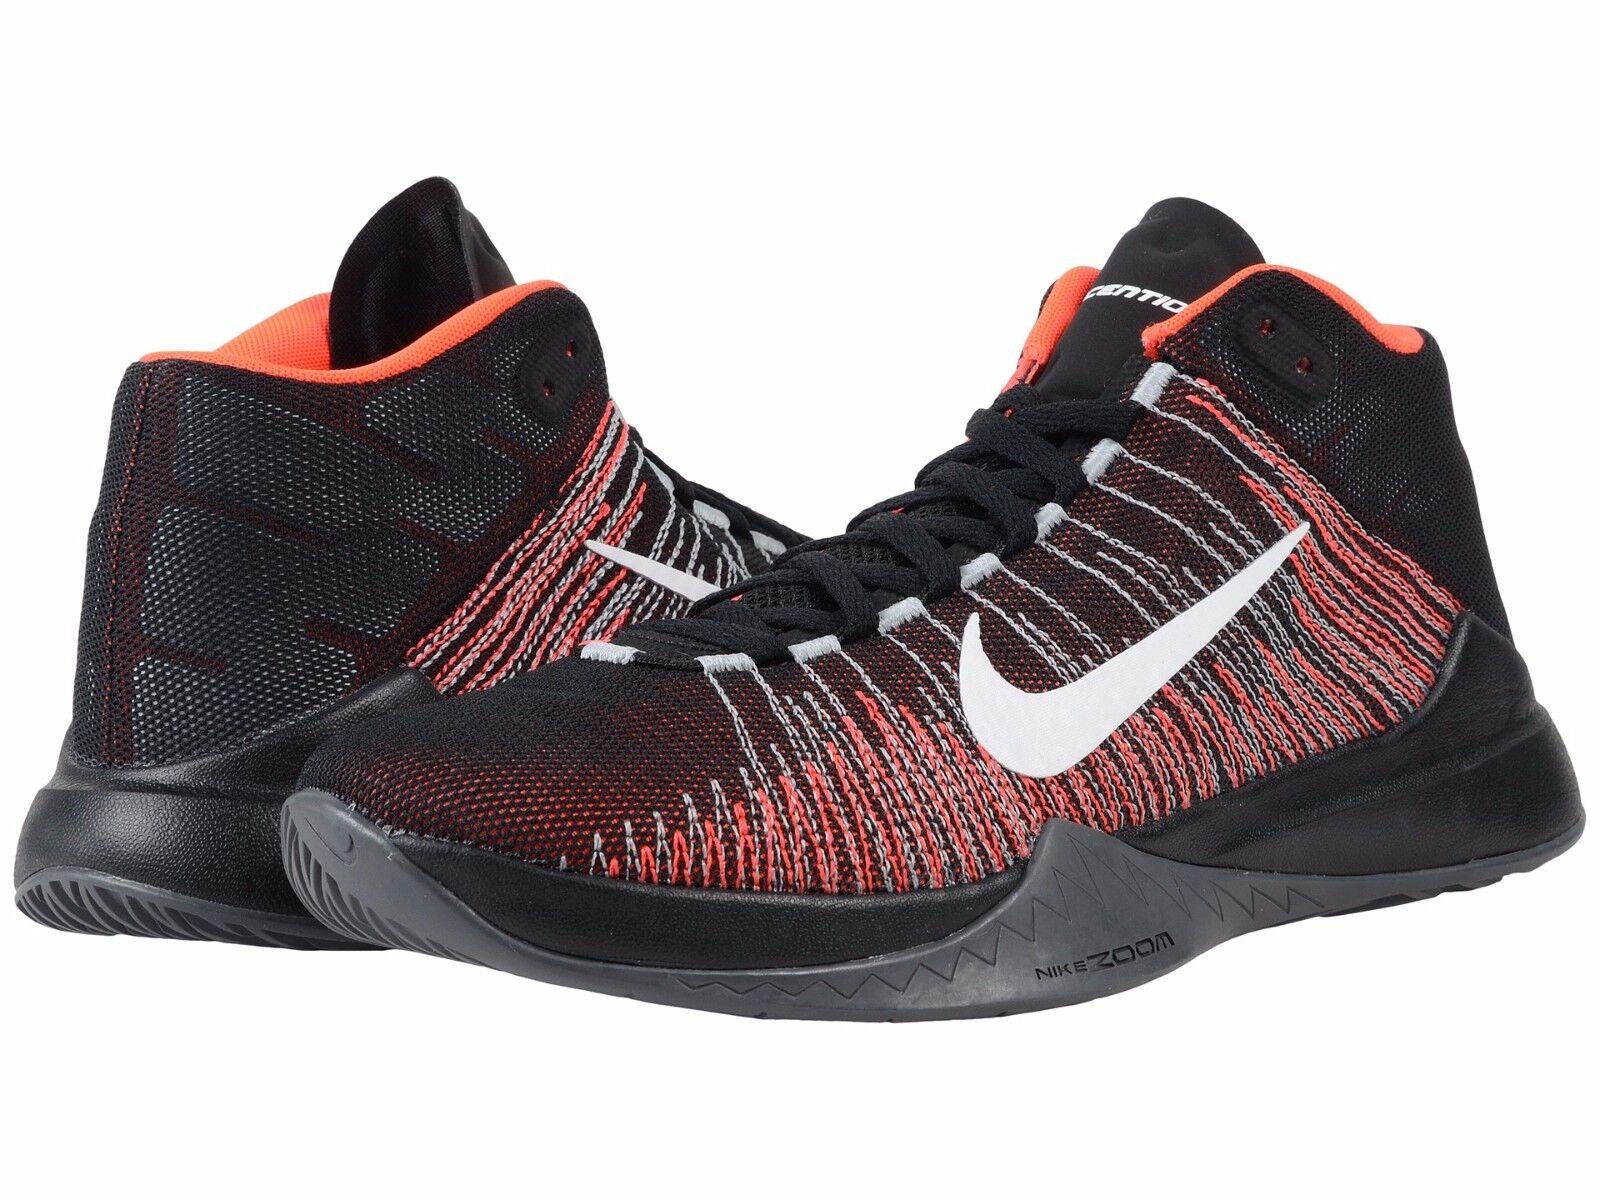 reputable site 8217c bbff2 ... Nike Mens Basketball Sneakers Zoom Ascention Black White Crimson Black  White Crimson Ascention SZ 12 719b46 ...